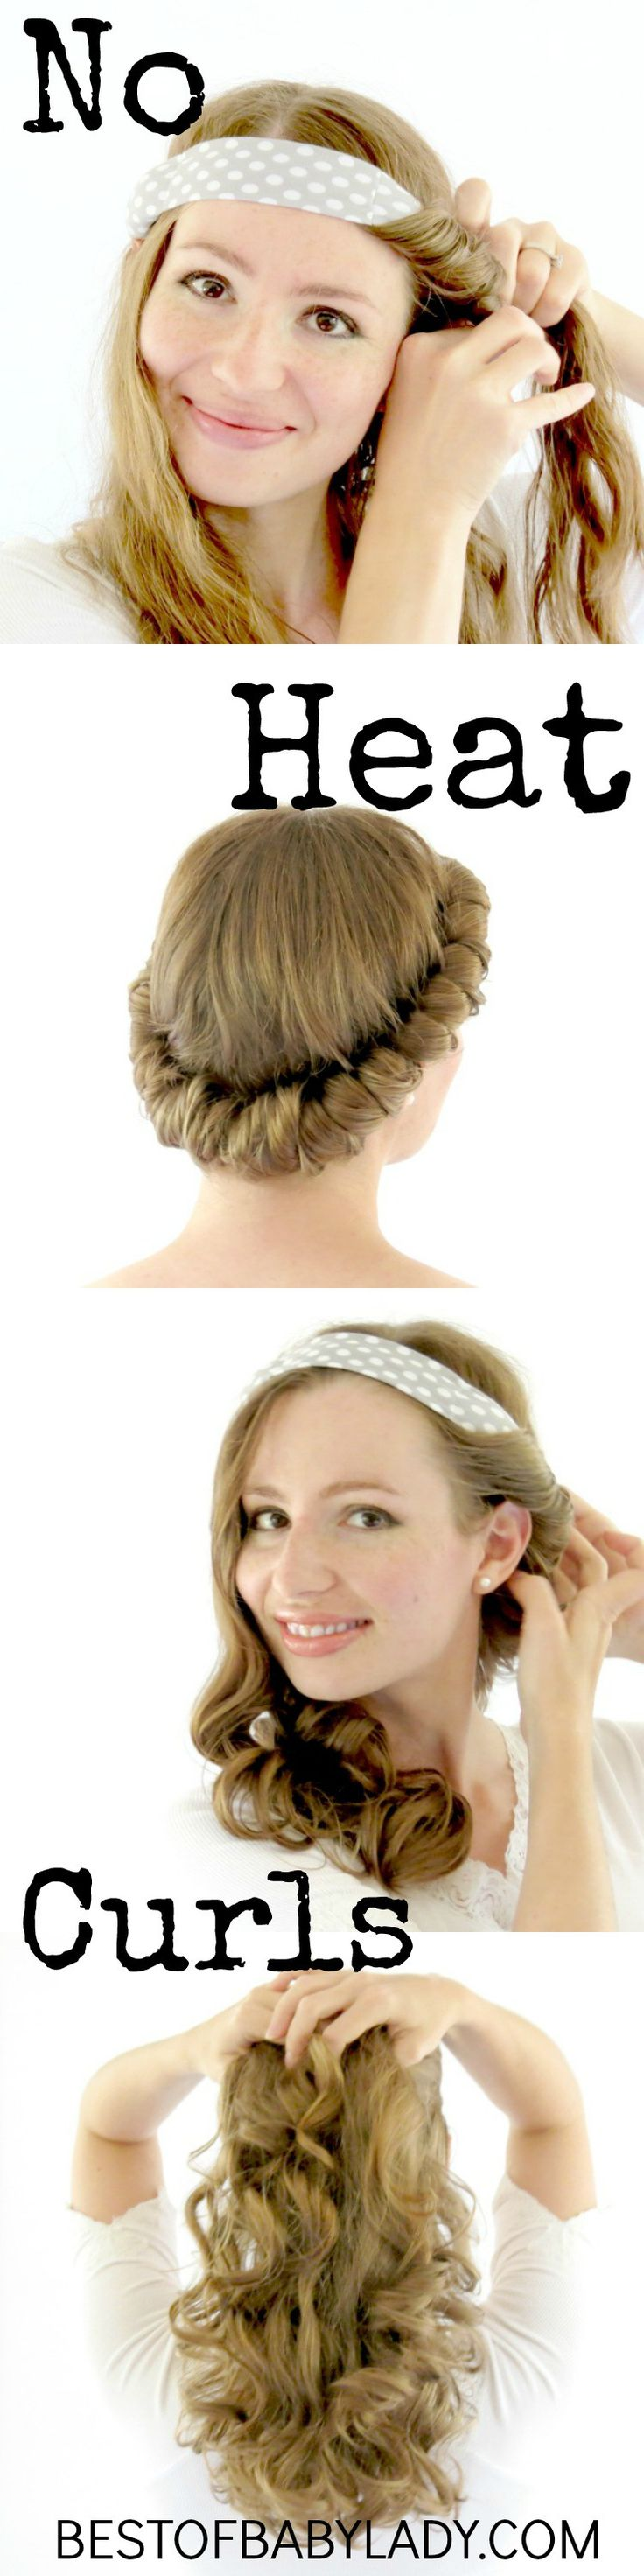 Easy, no heat curls WWW.BESTOFBABYLADY.COM #TwinklyTuesday